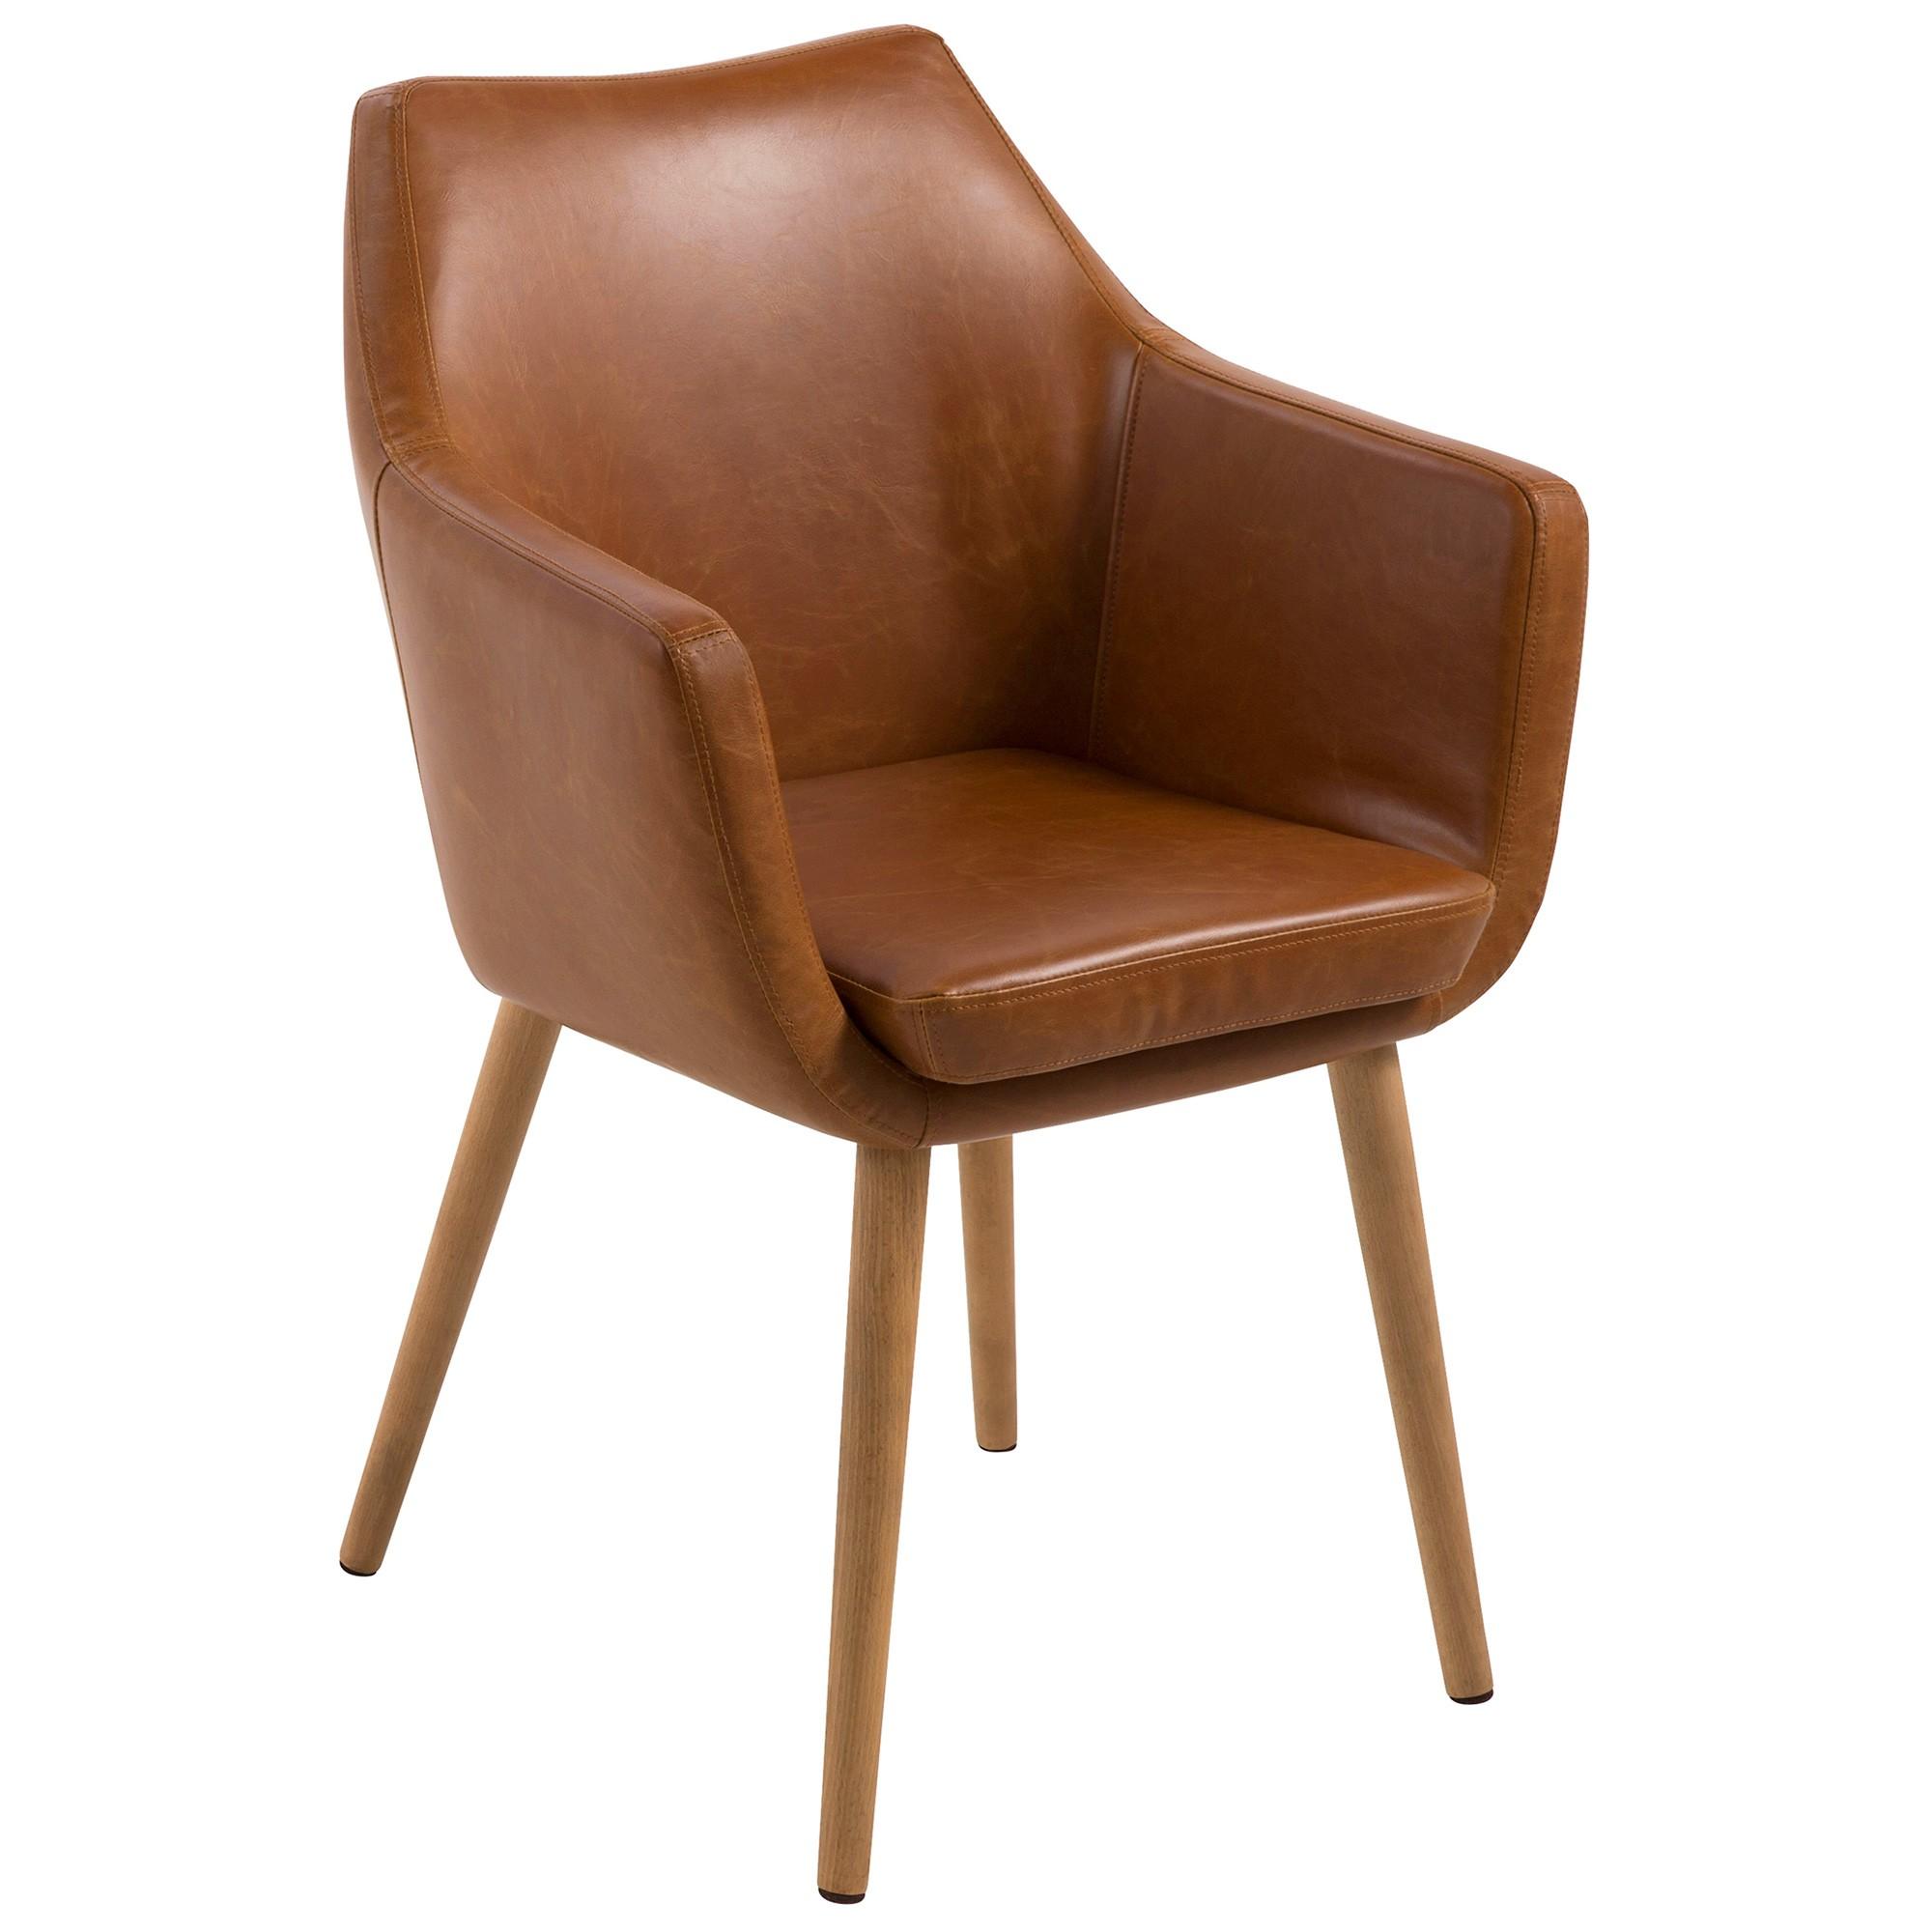 Chloe PU Leather Carver Chair